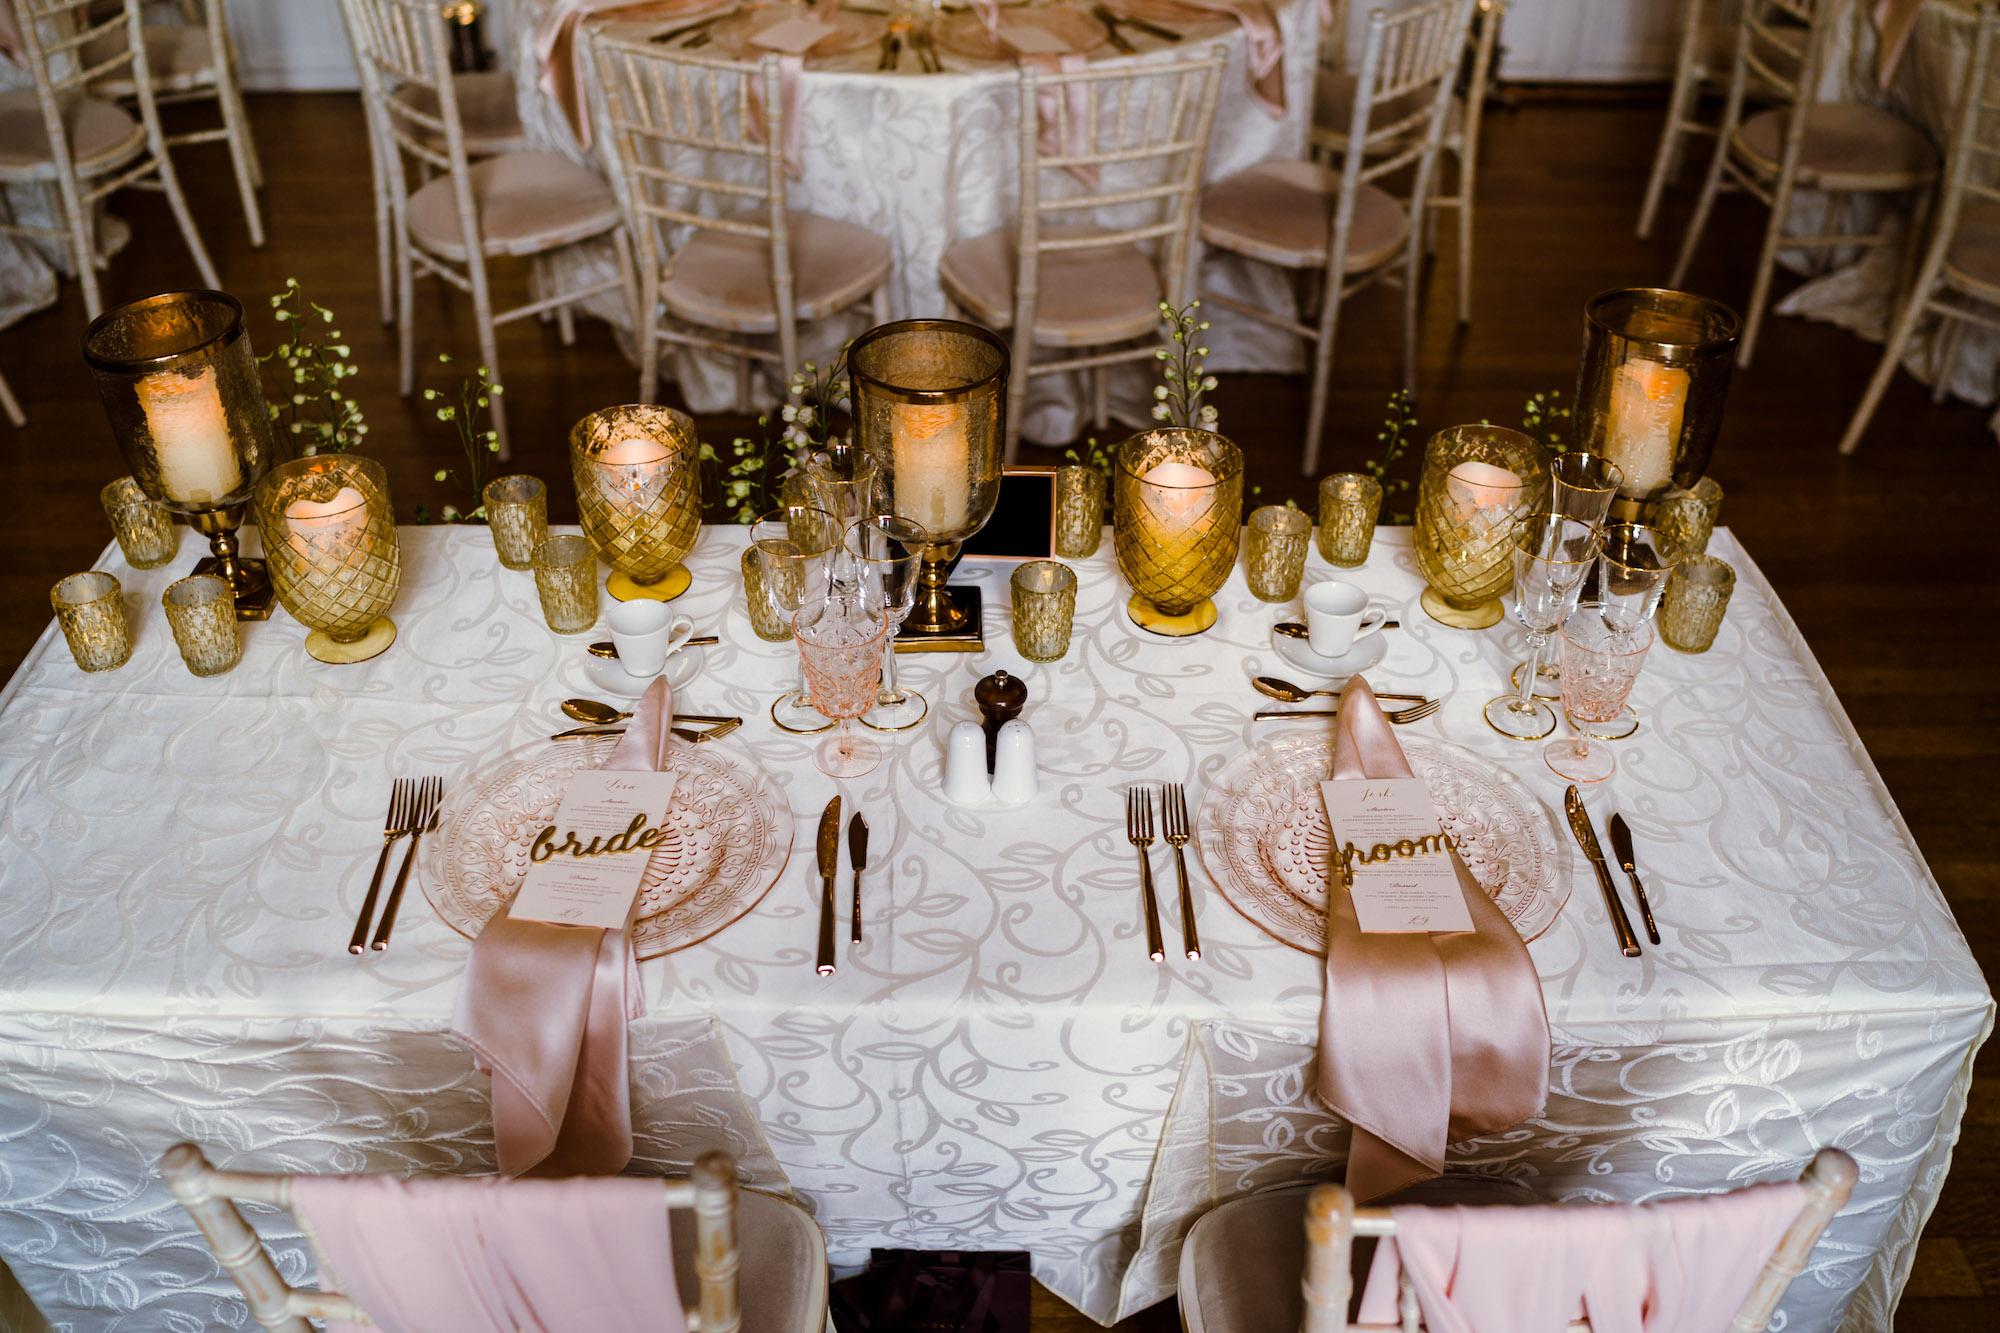 66a   Hengrave Hall Wedding   Suffolk Wedding   Lamare London   Luxury Wedding Planner   Jon Mold Photography.jpg